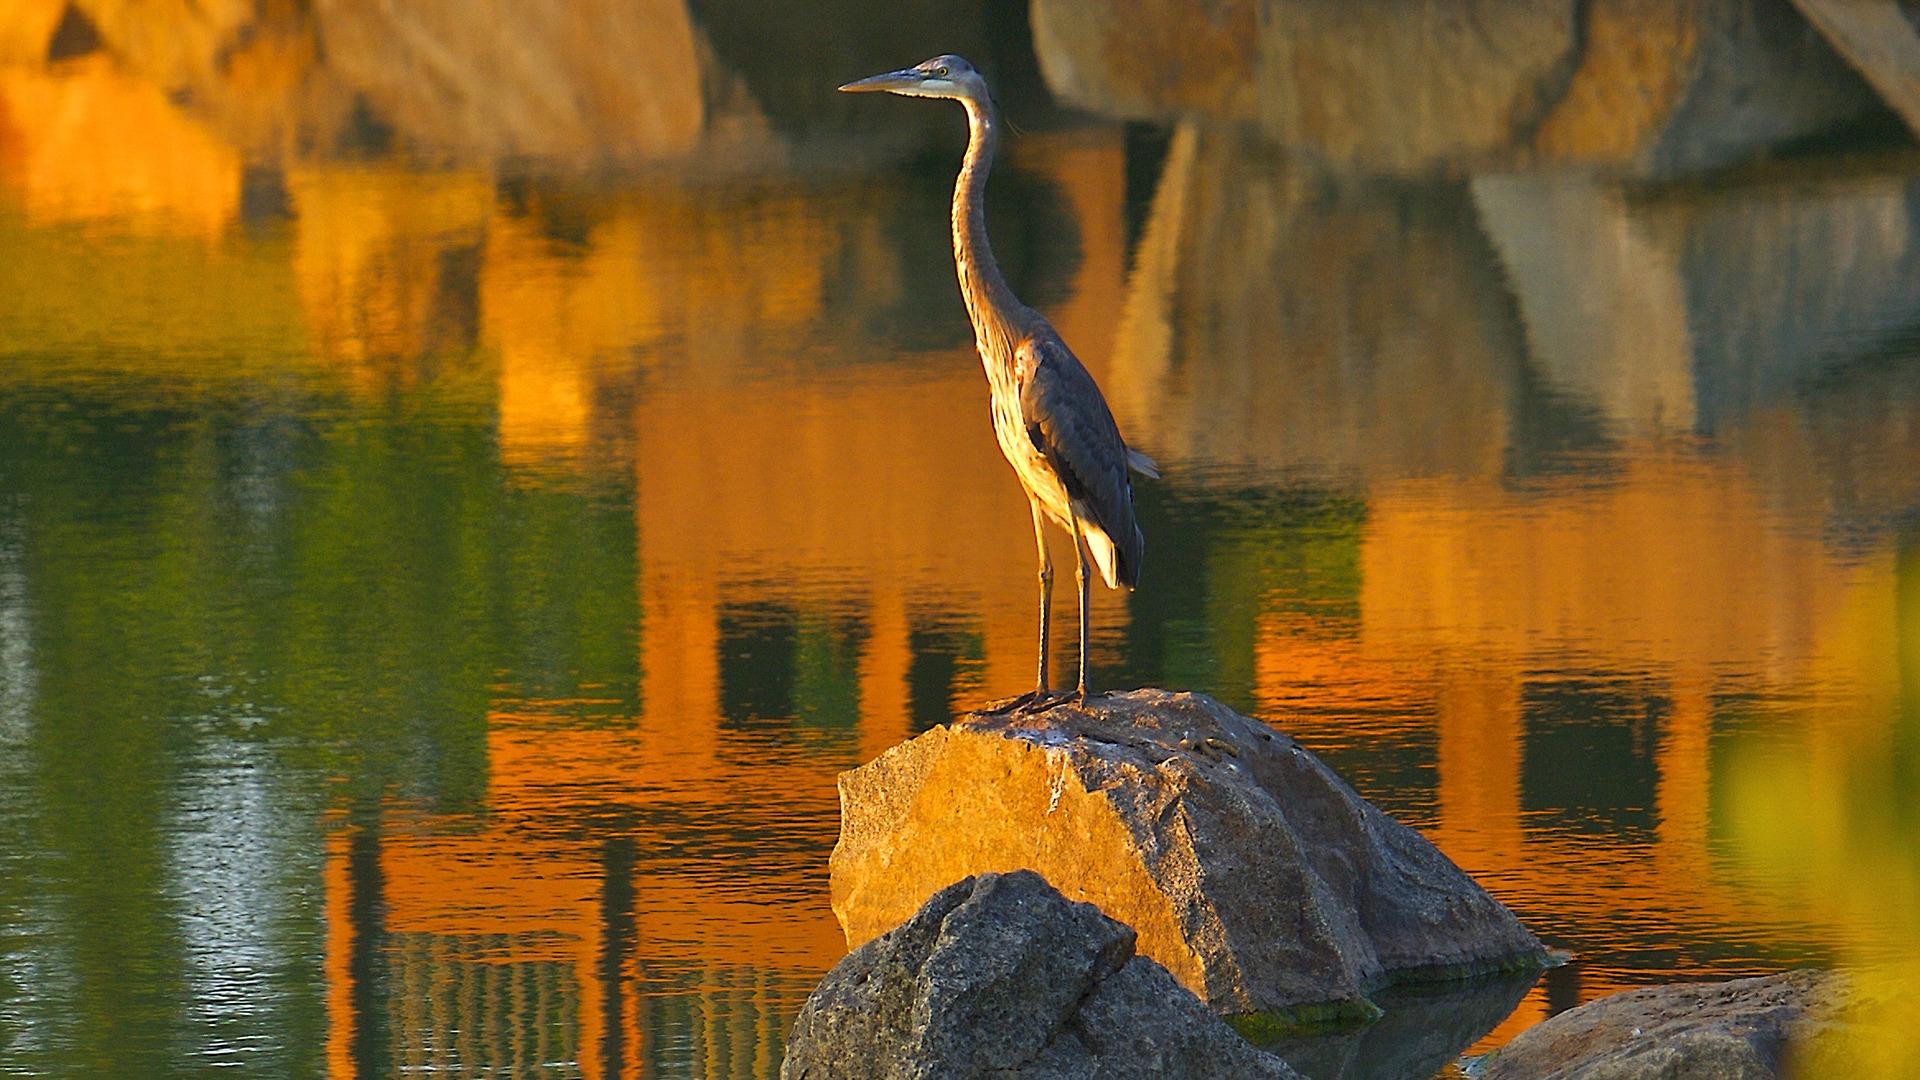 A heron on a rock in Brambleton pond.